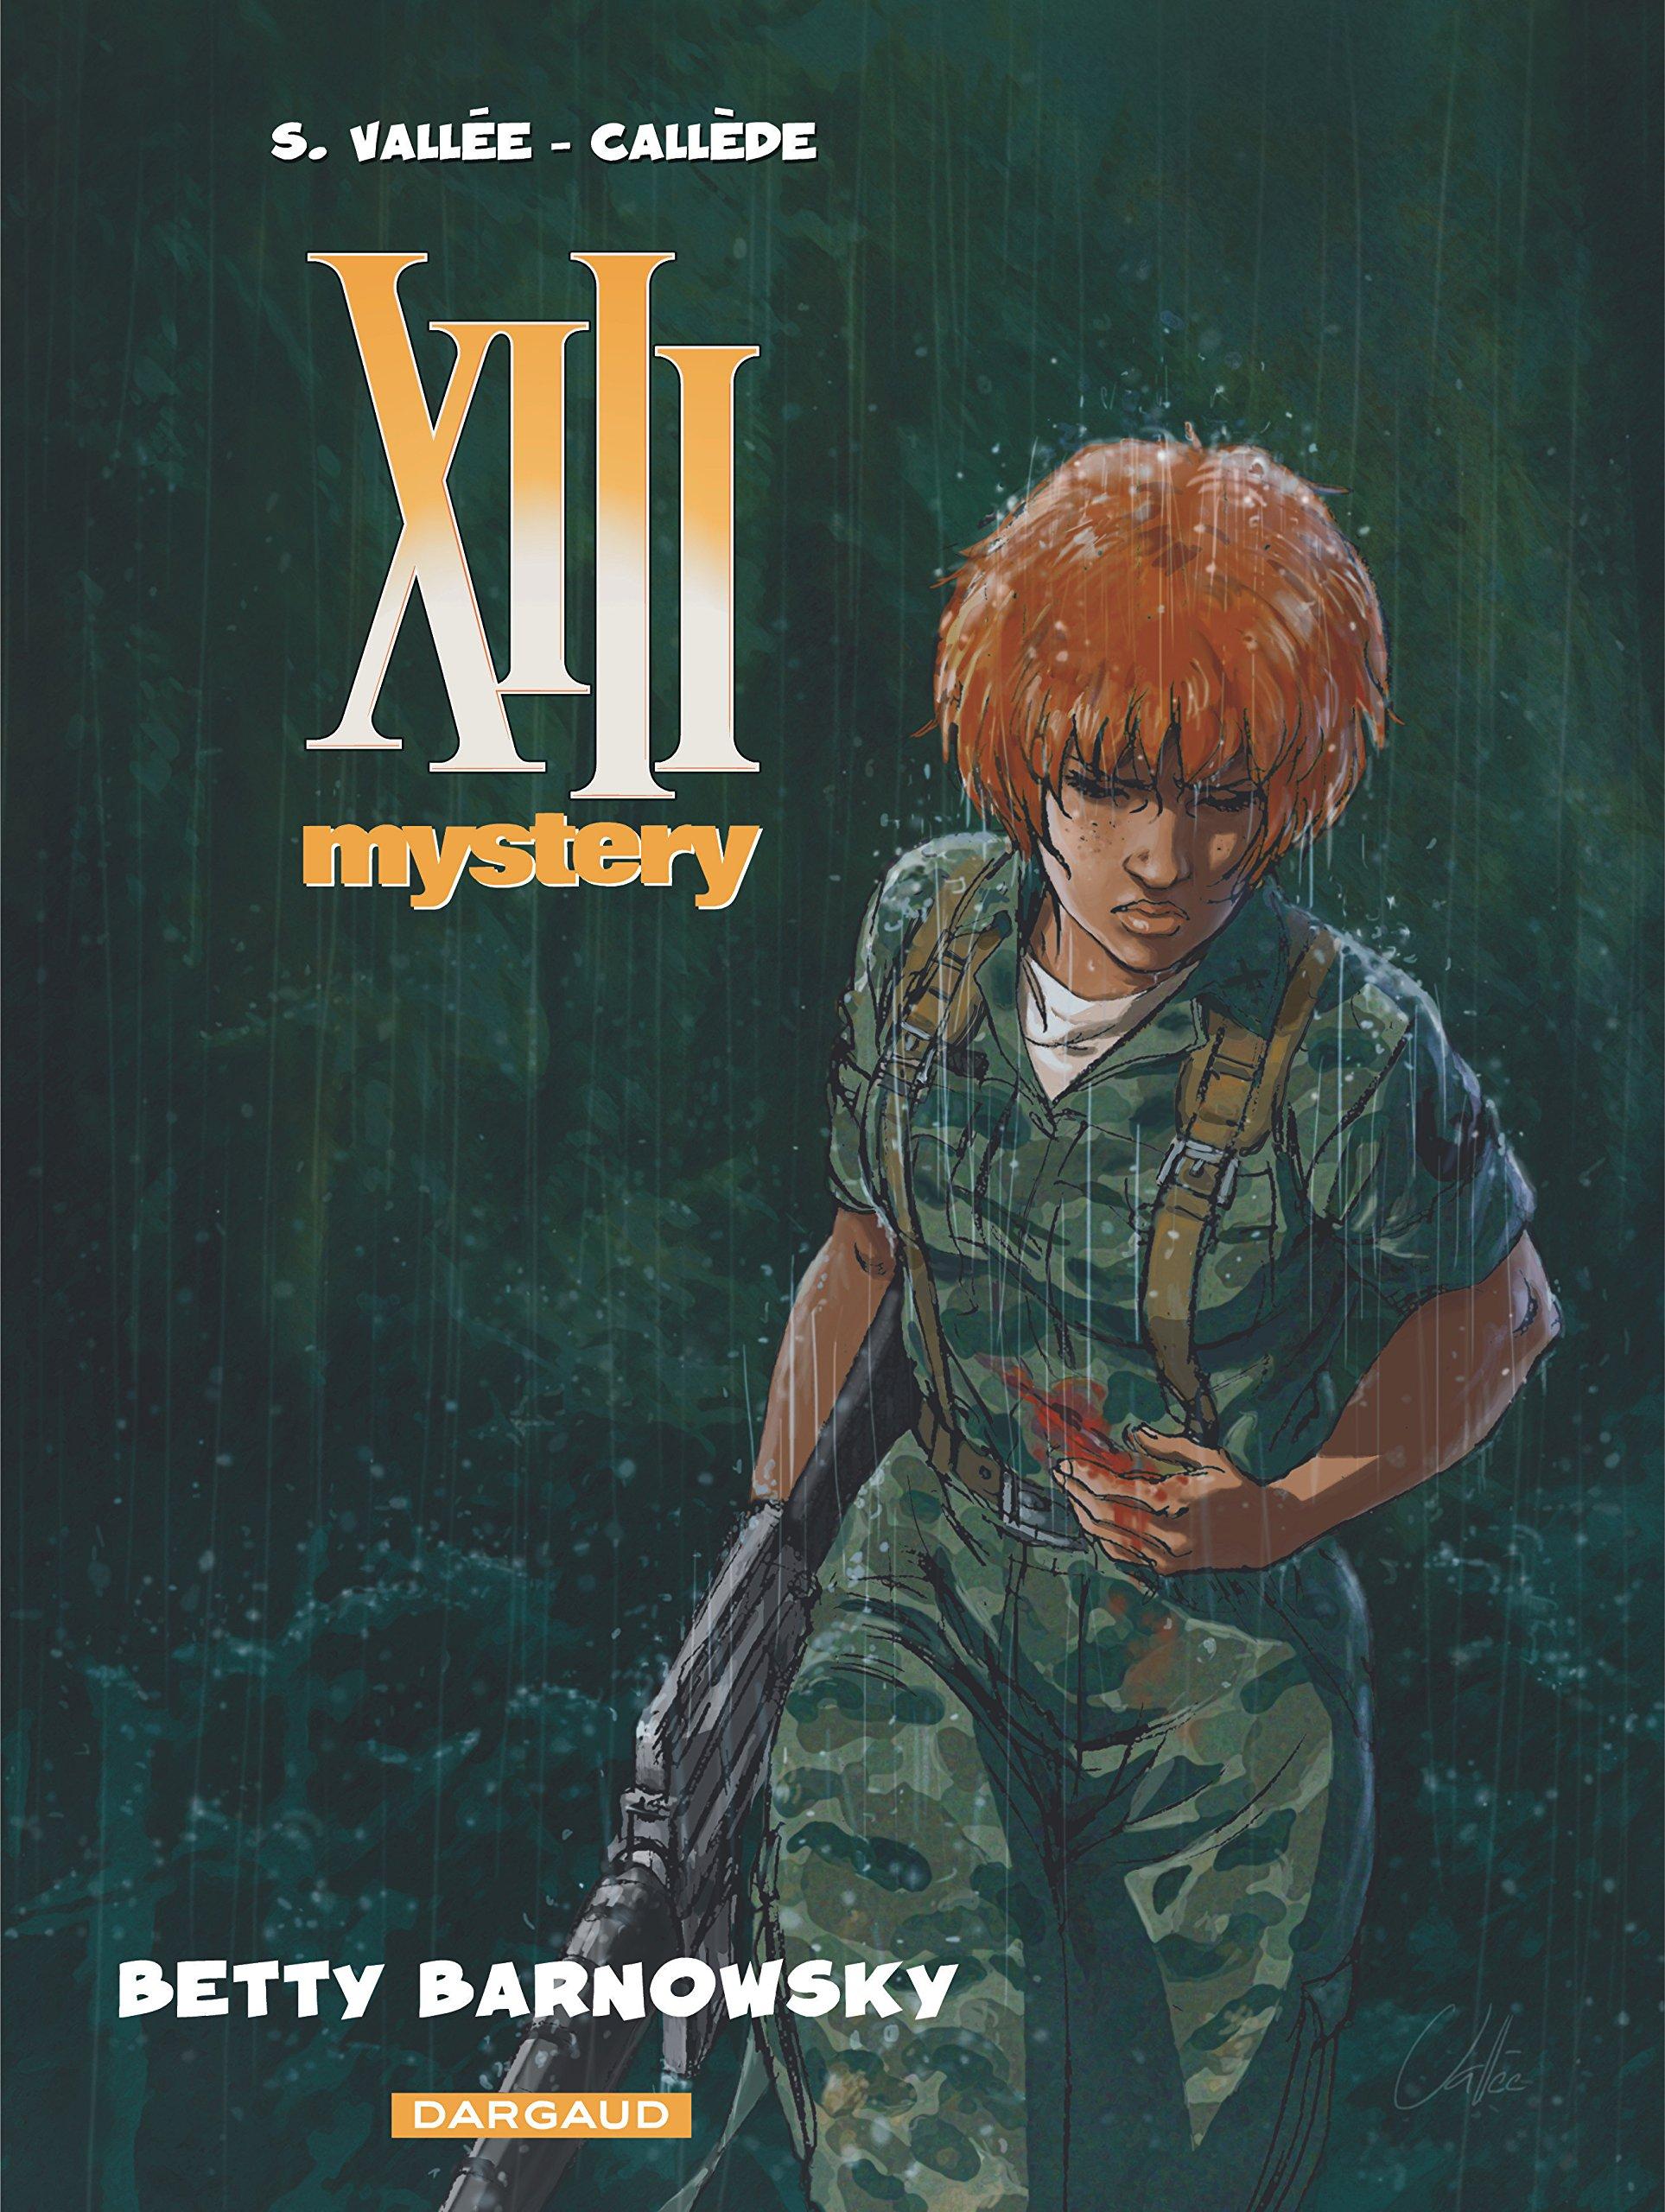 XIII Mystery, tome 7 : Betty Barnowsky: Amazon.de: Joël Callède, Sylvain  Vallée: Fremdsprachige Bücher